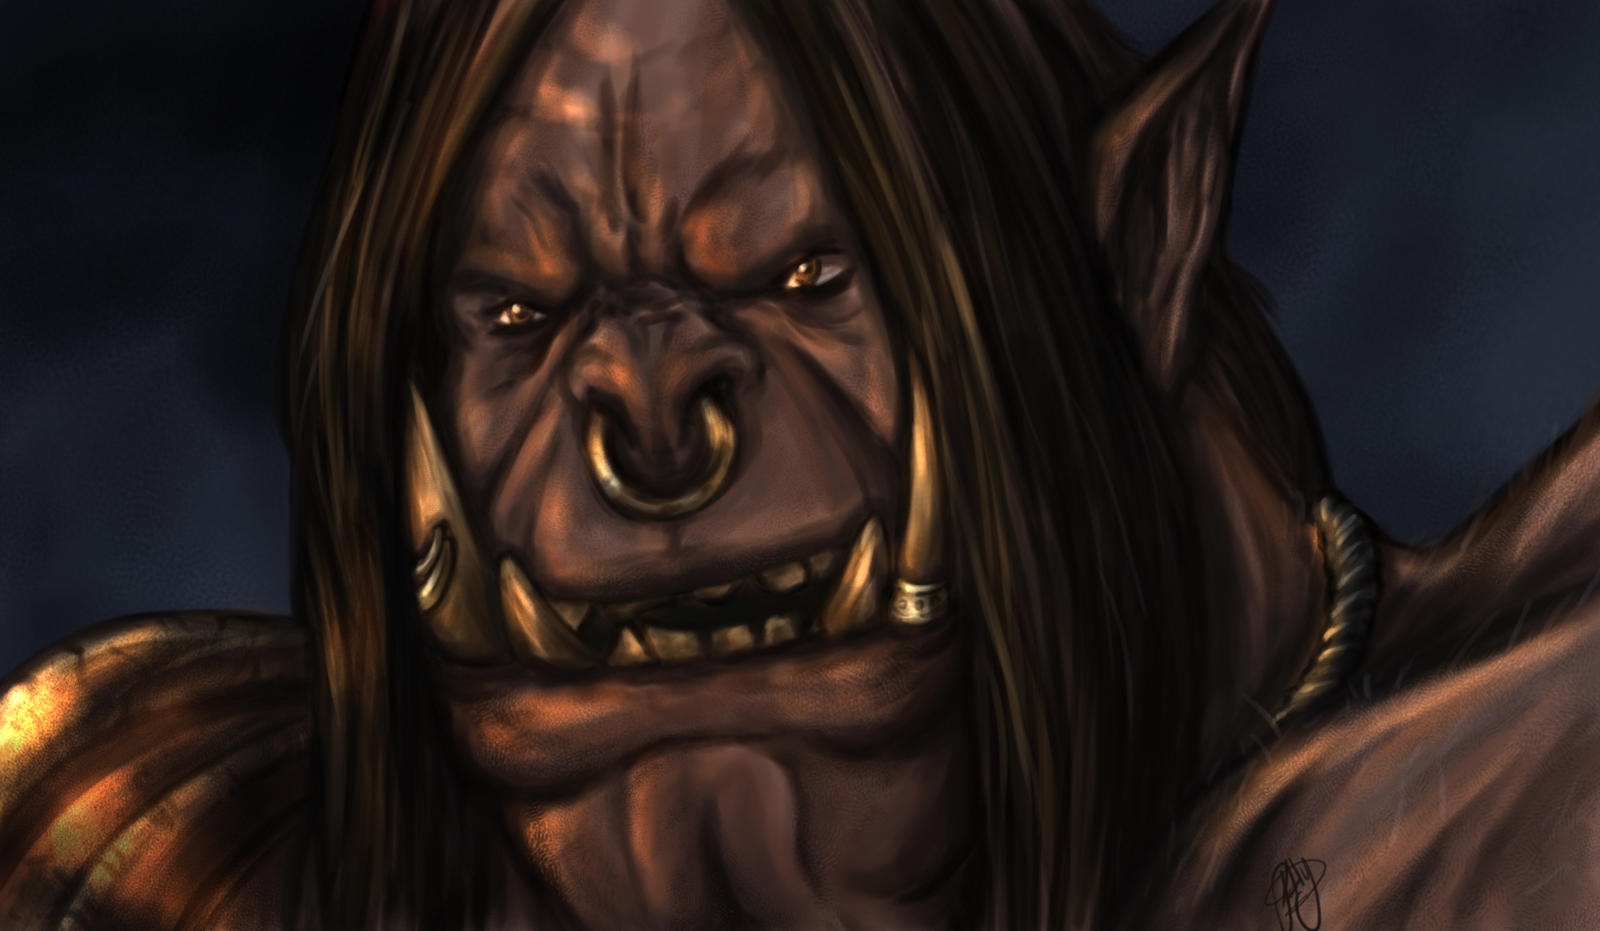 Warcraft slaves hentia photos